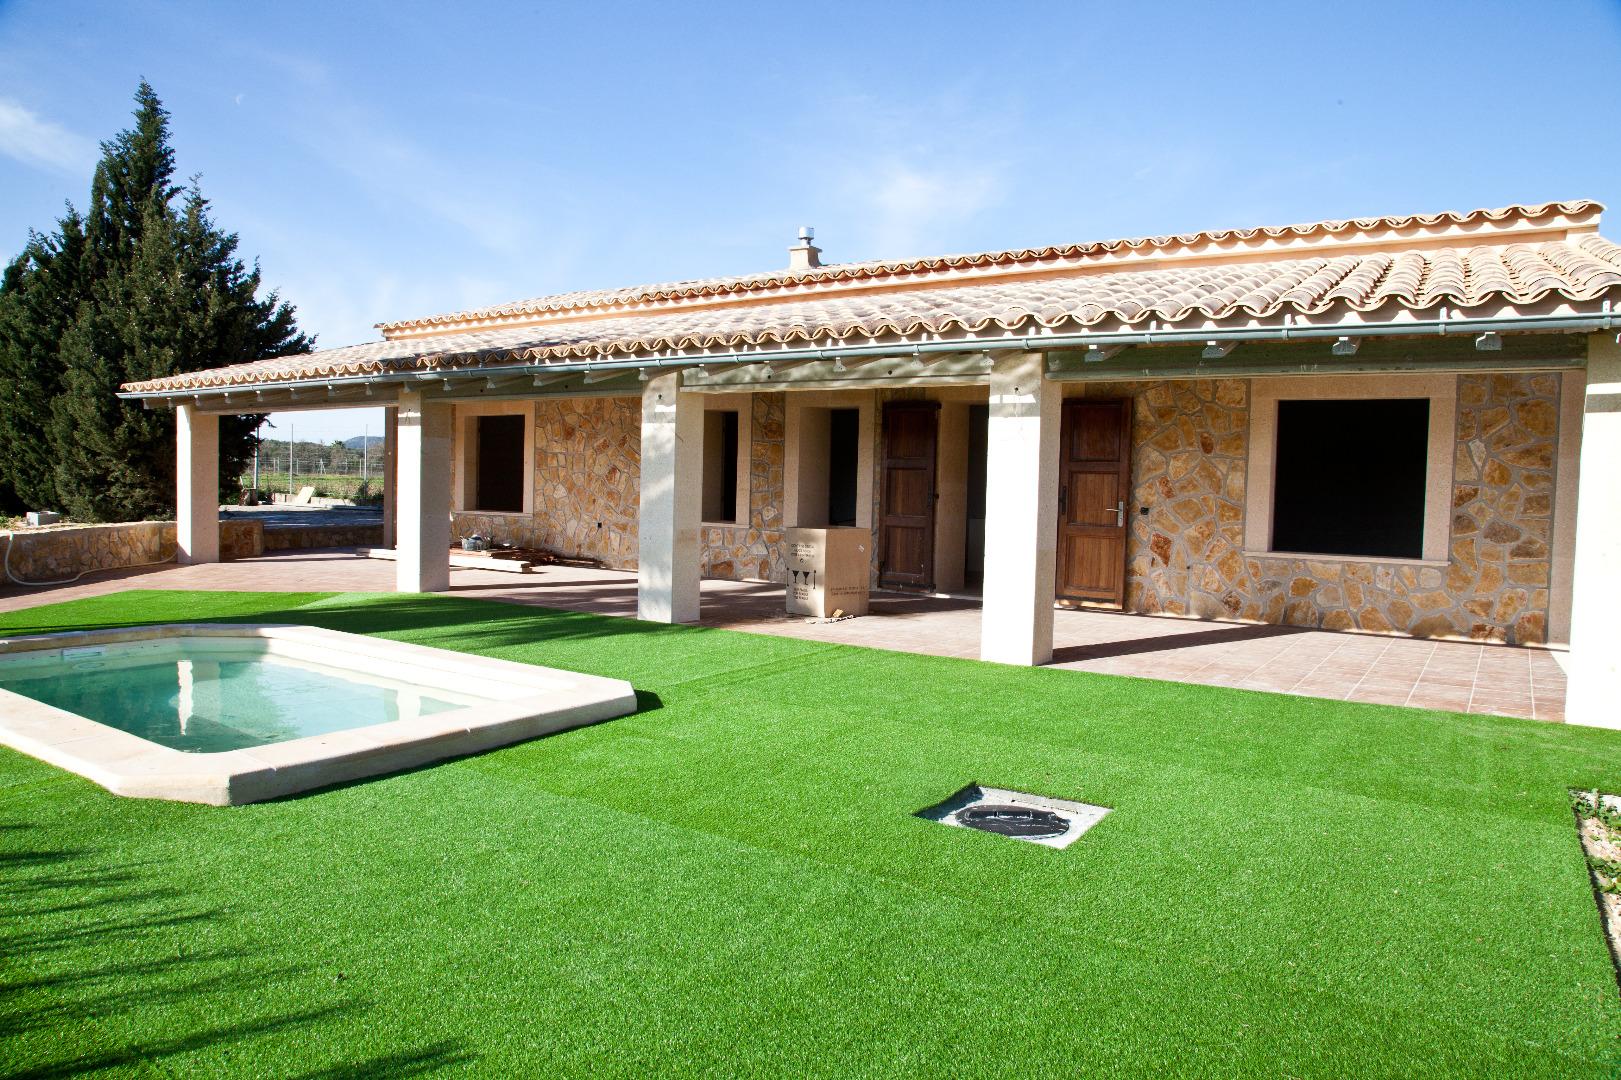 Rent House  Carrer del sol. Bonita y acogedora casa de campo a las afueras de petra